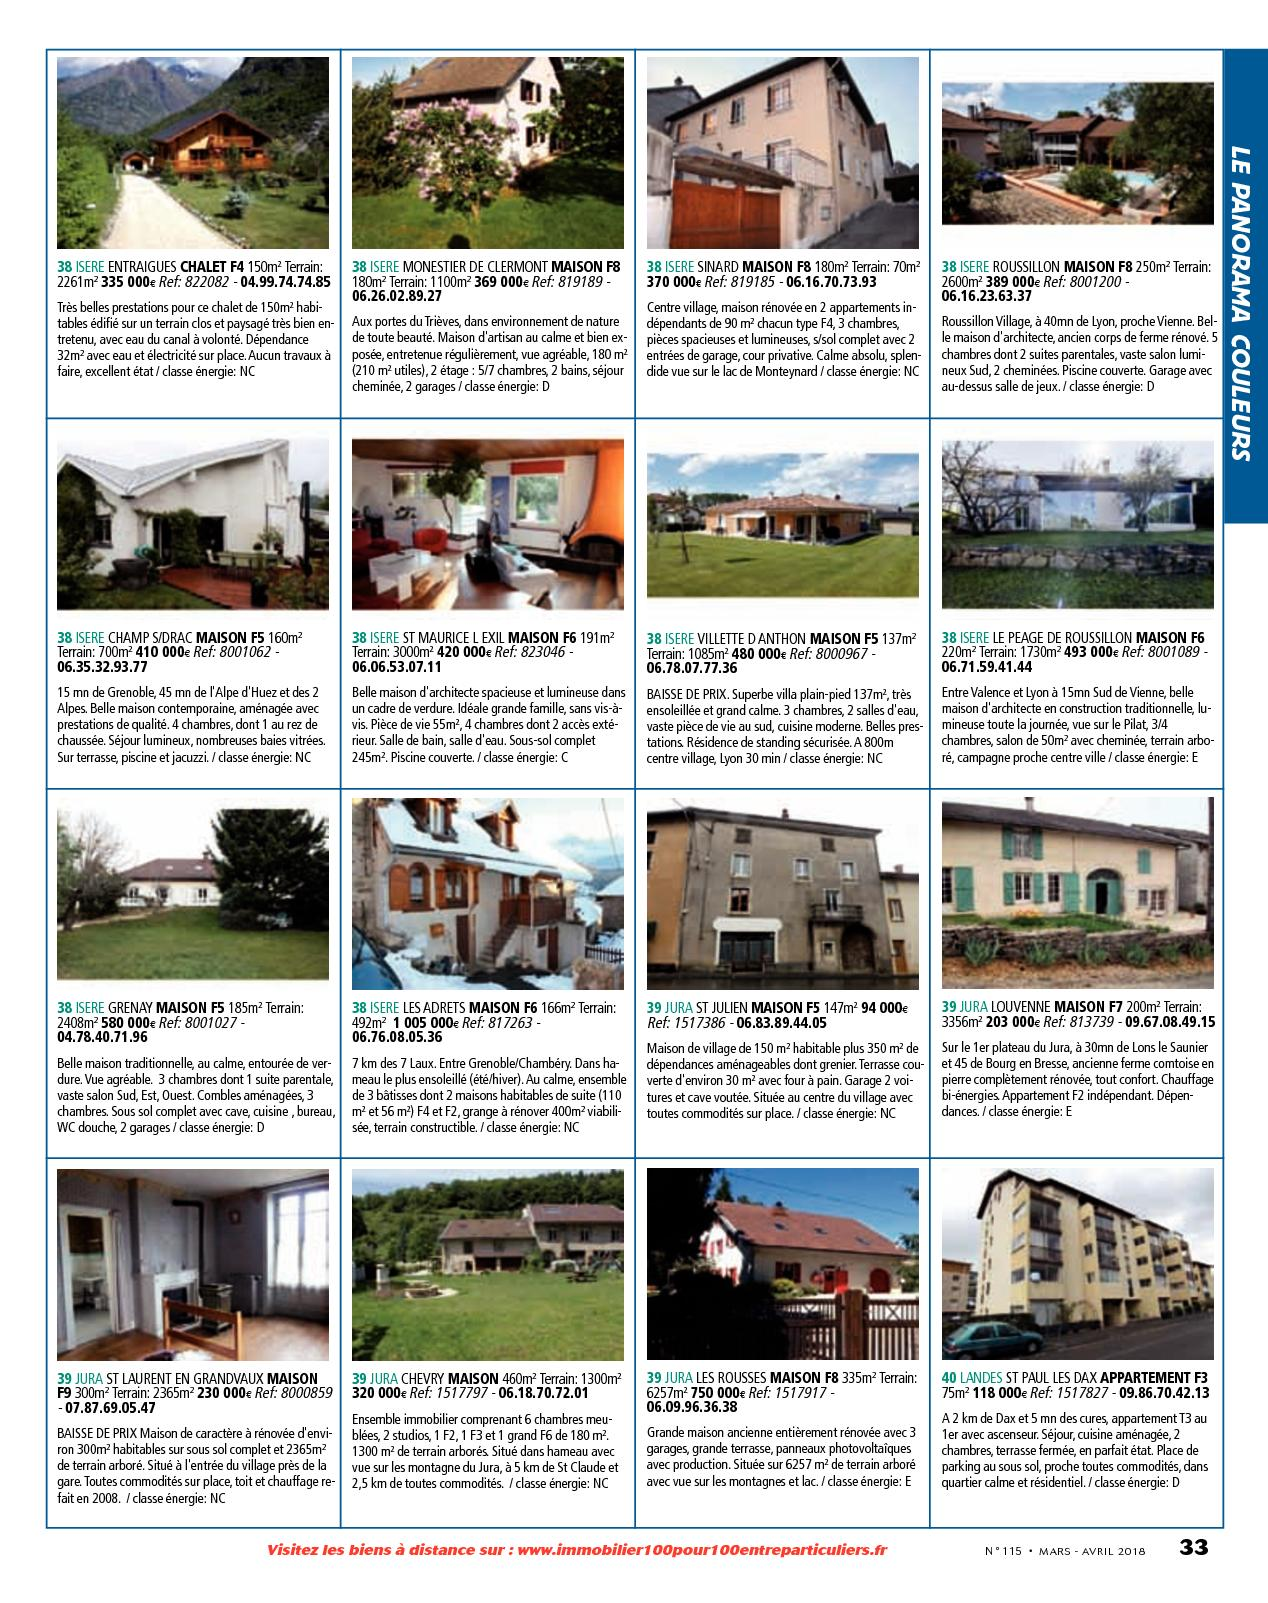 L Immobilier 100 Entre Particuliers Appelimmo N 115 Mars